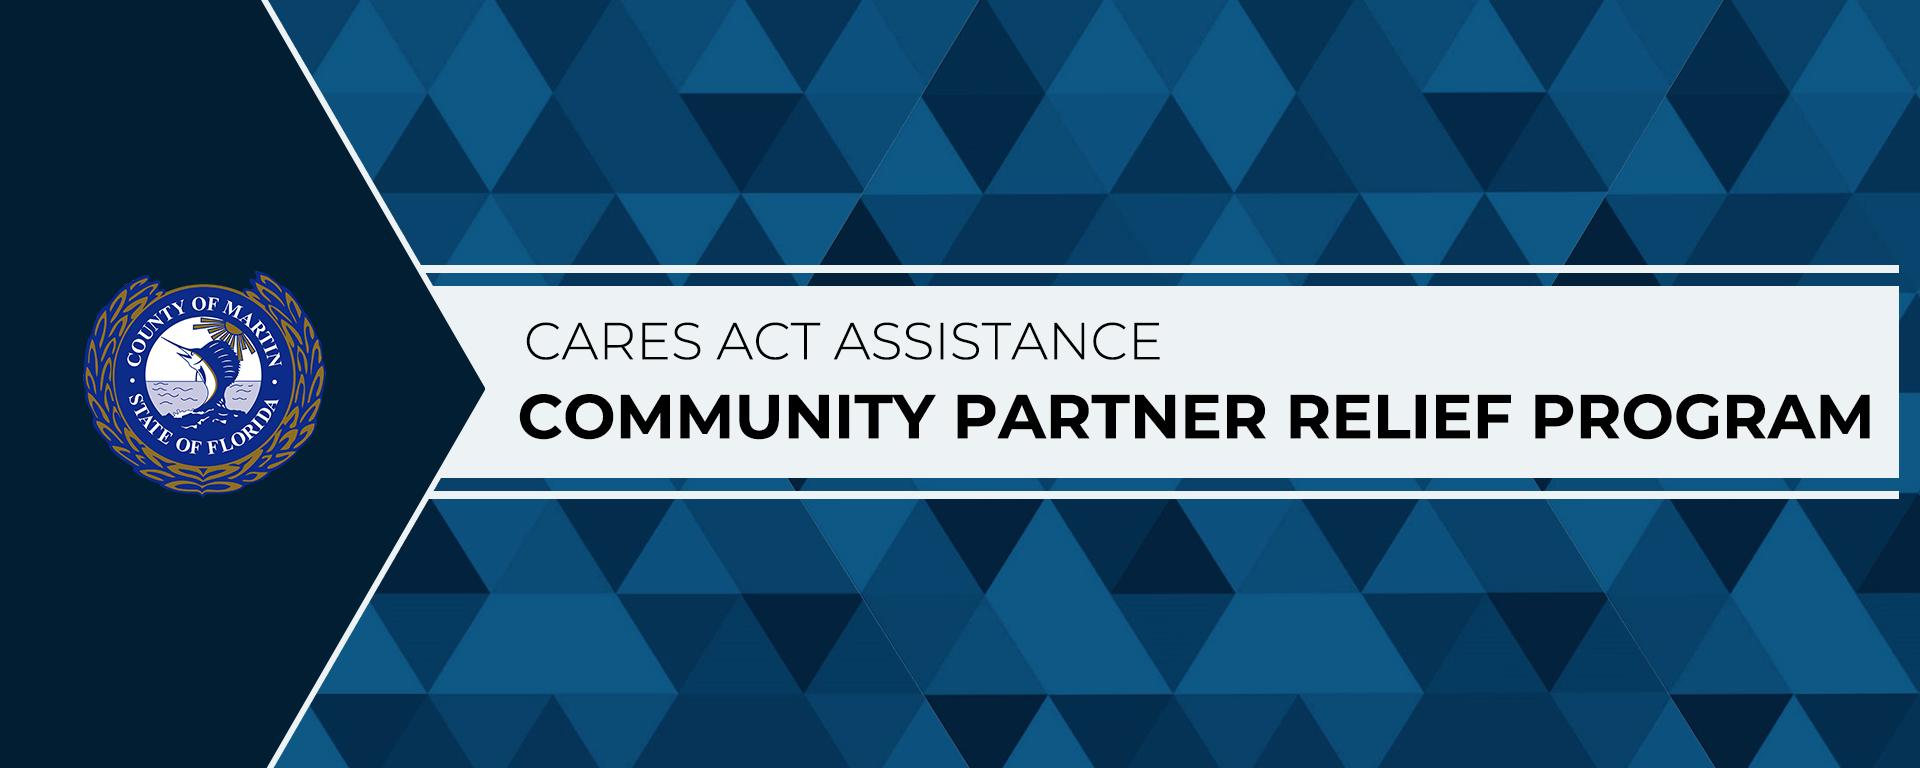 Community Partner Relief Program